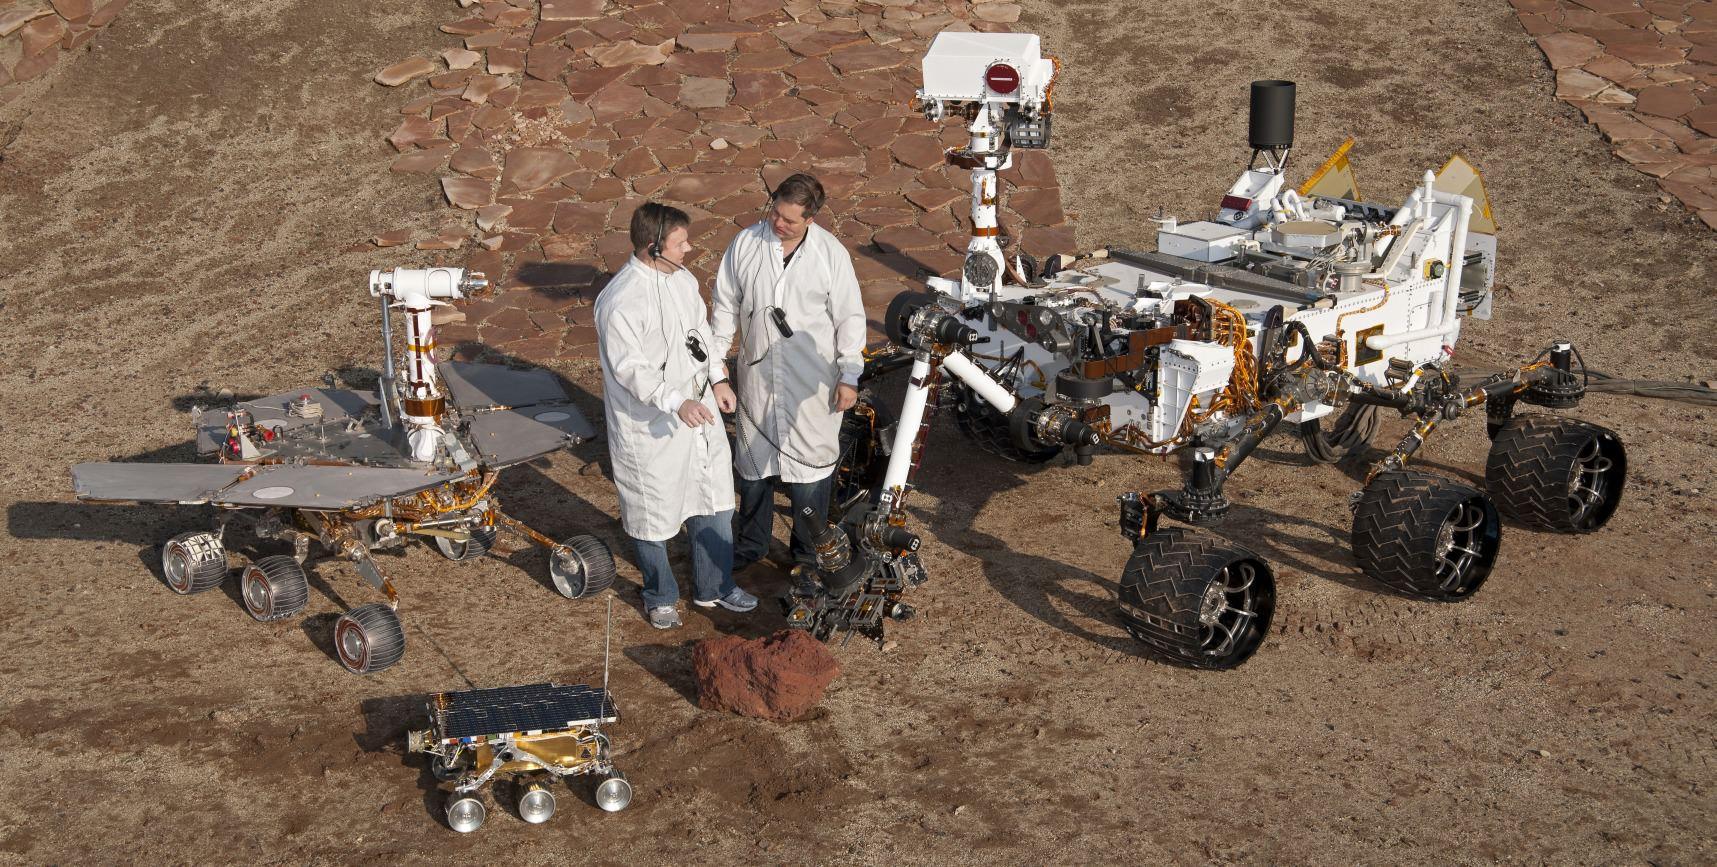 mars rover curiosity landing date - photo #10